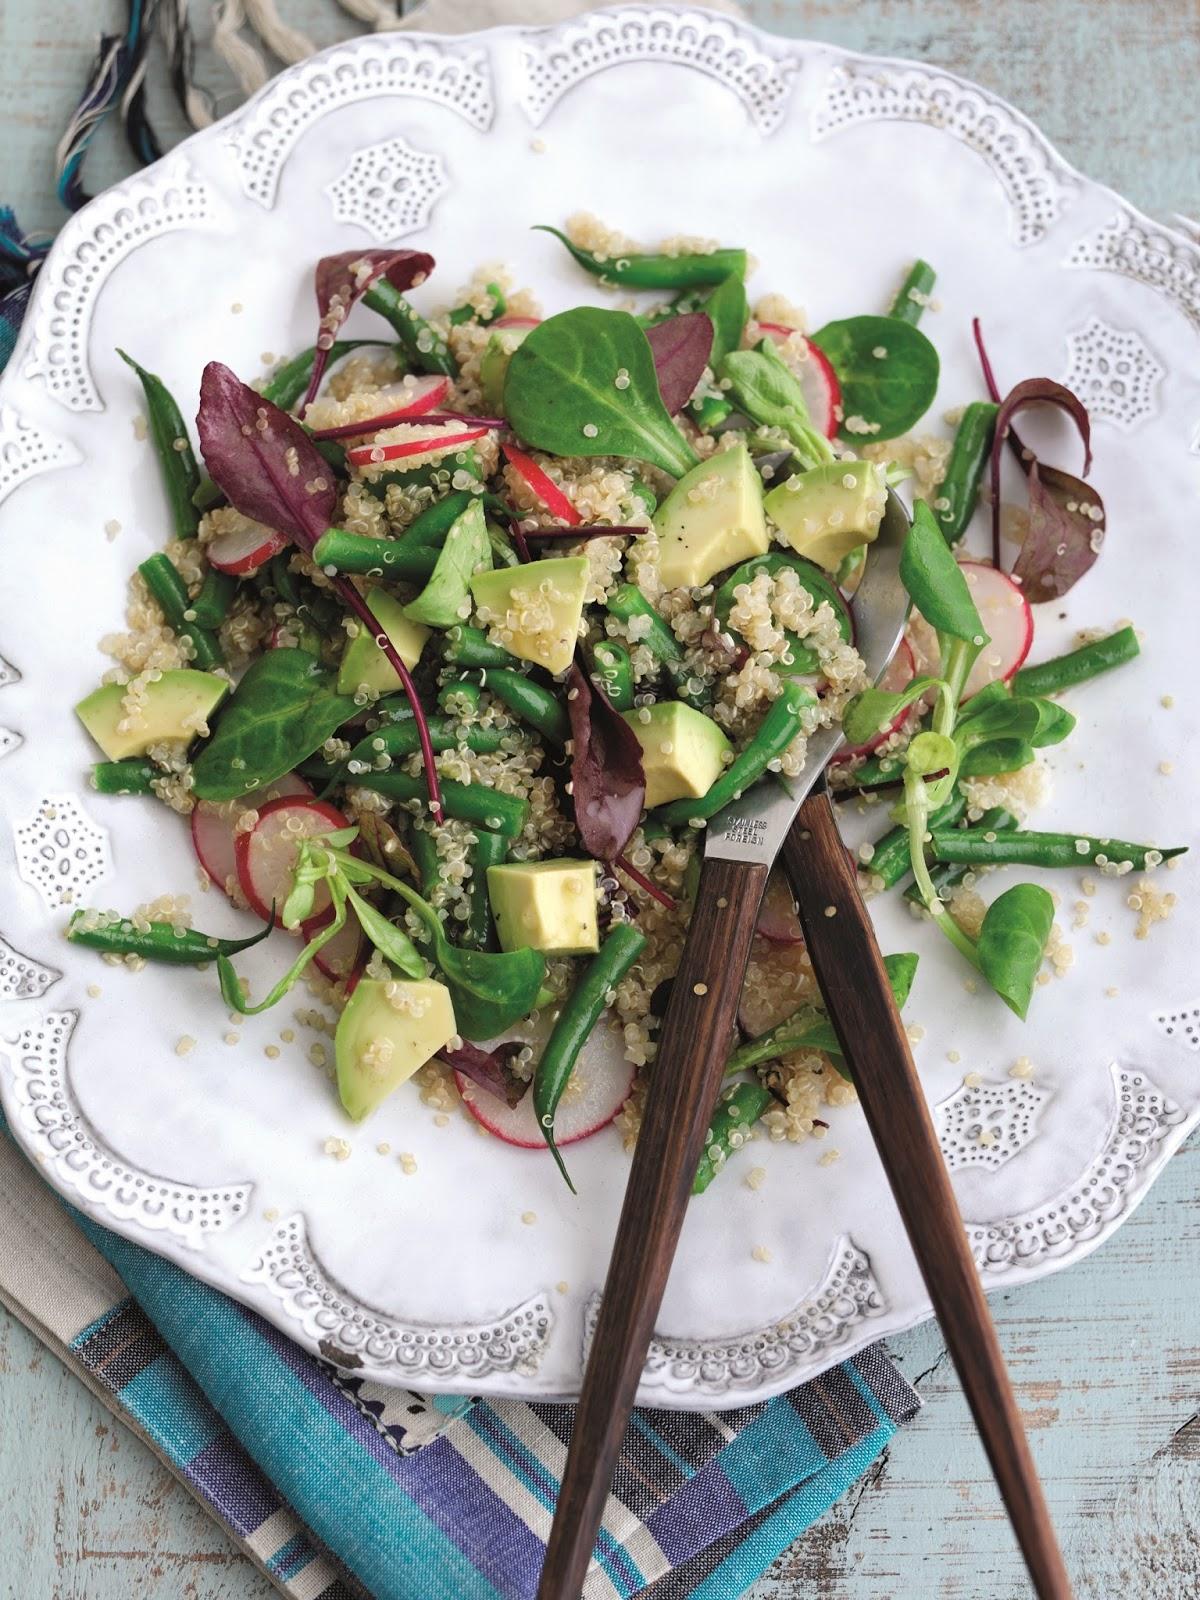 Avocado, Quinoa And Radish Salad